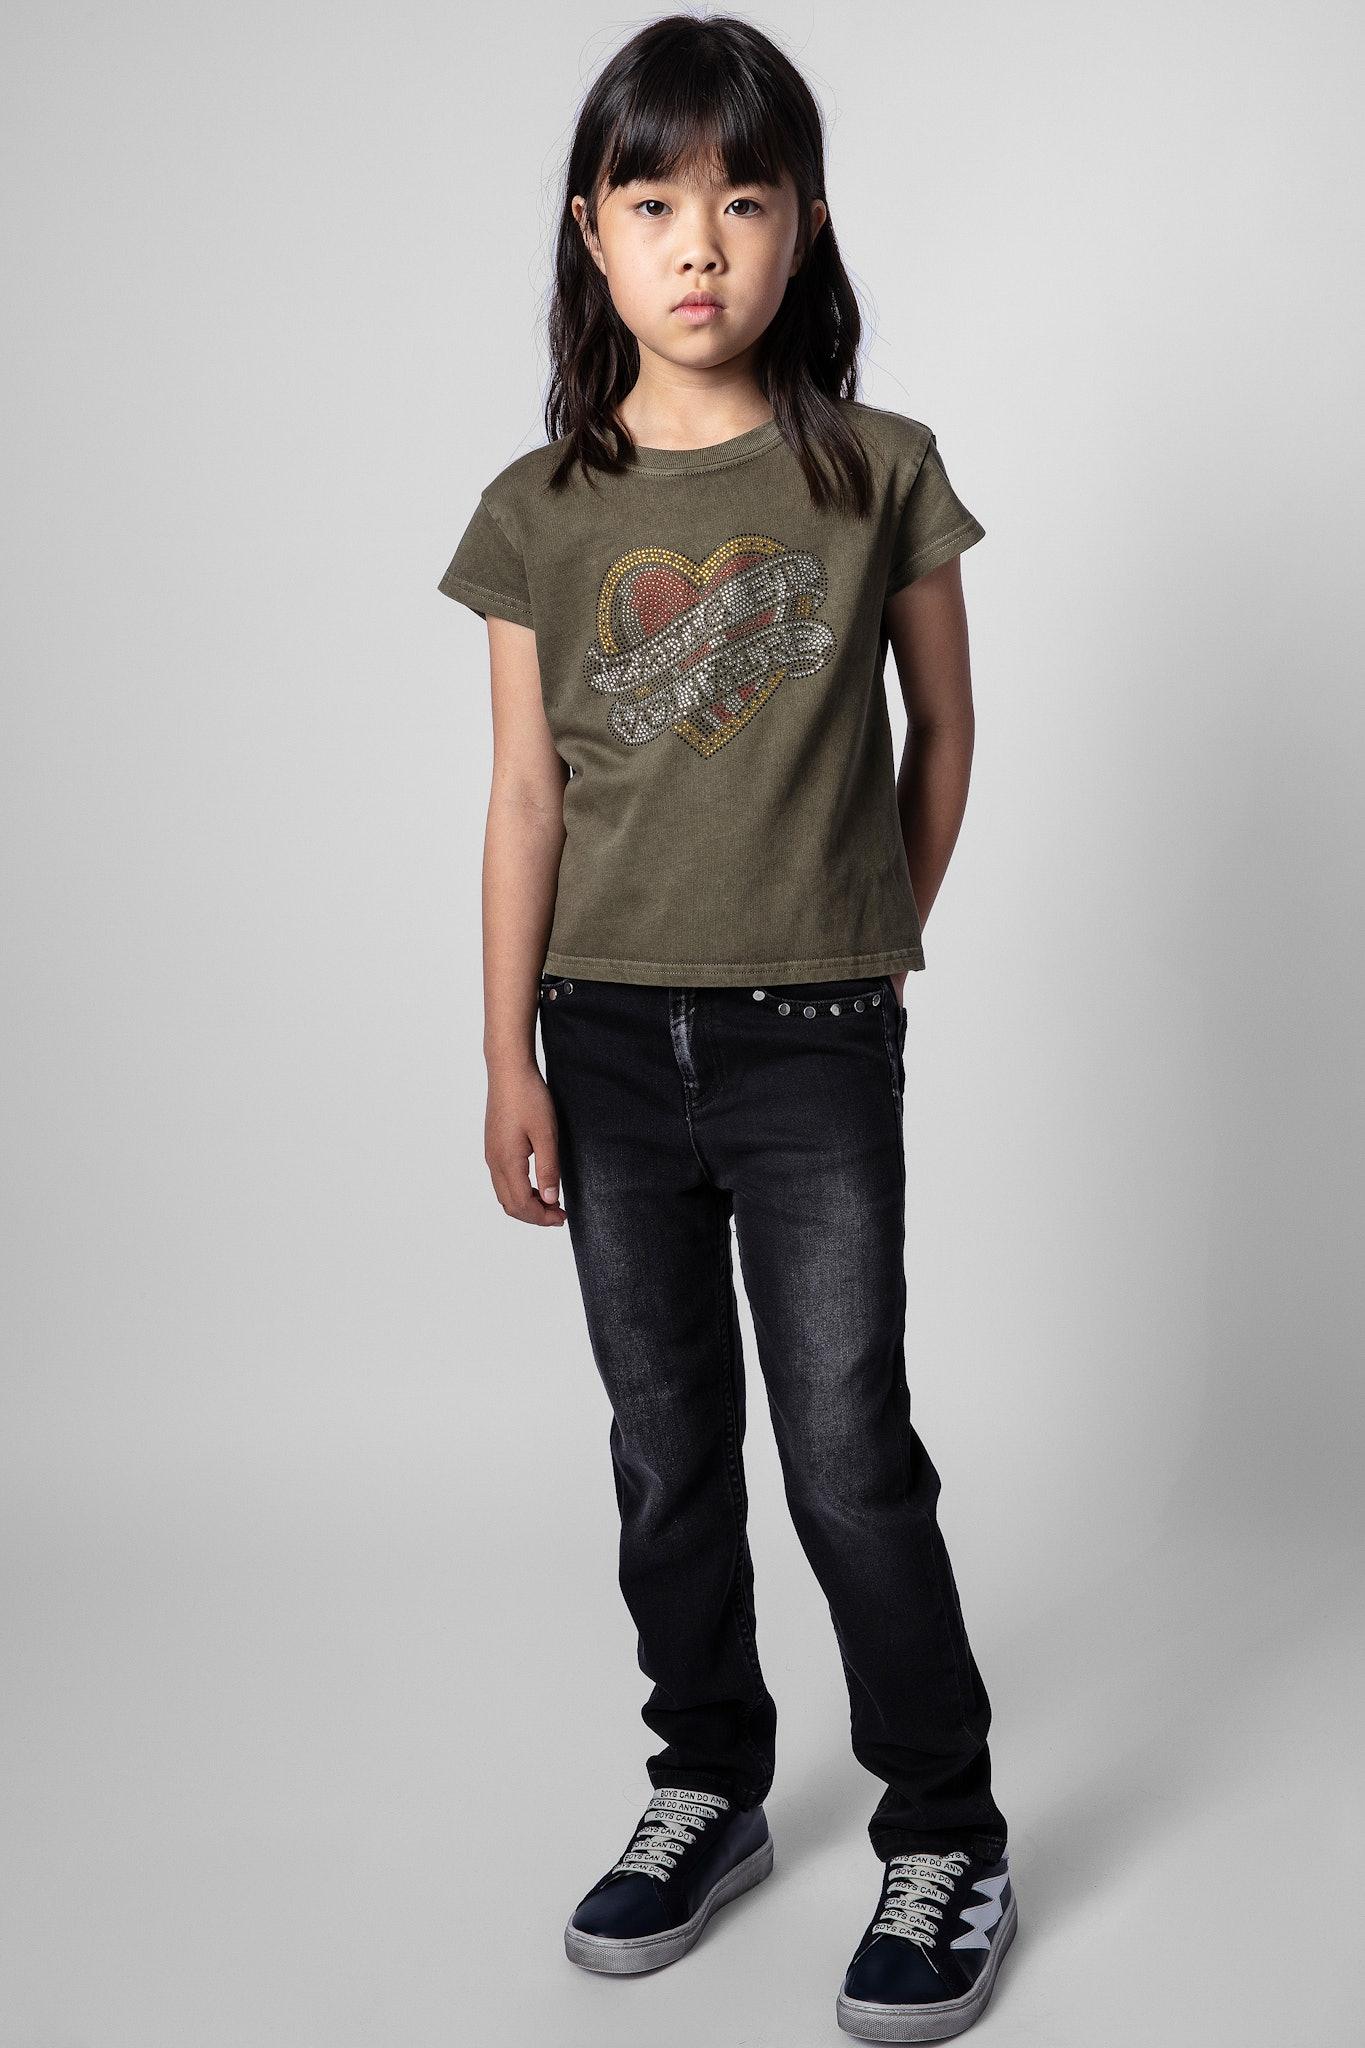 Camiseta Anie Infantil